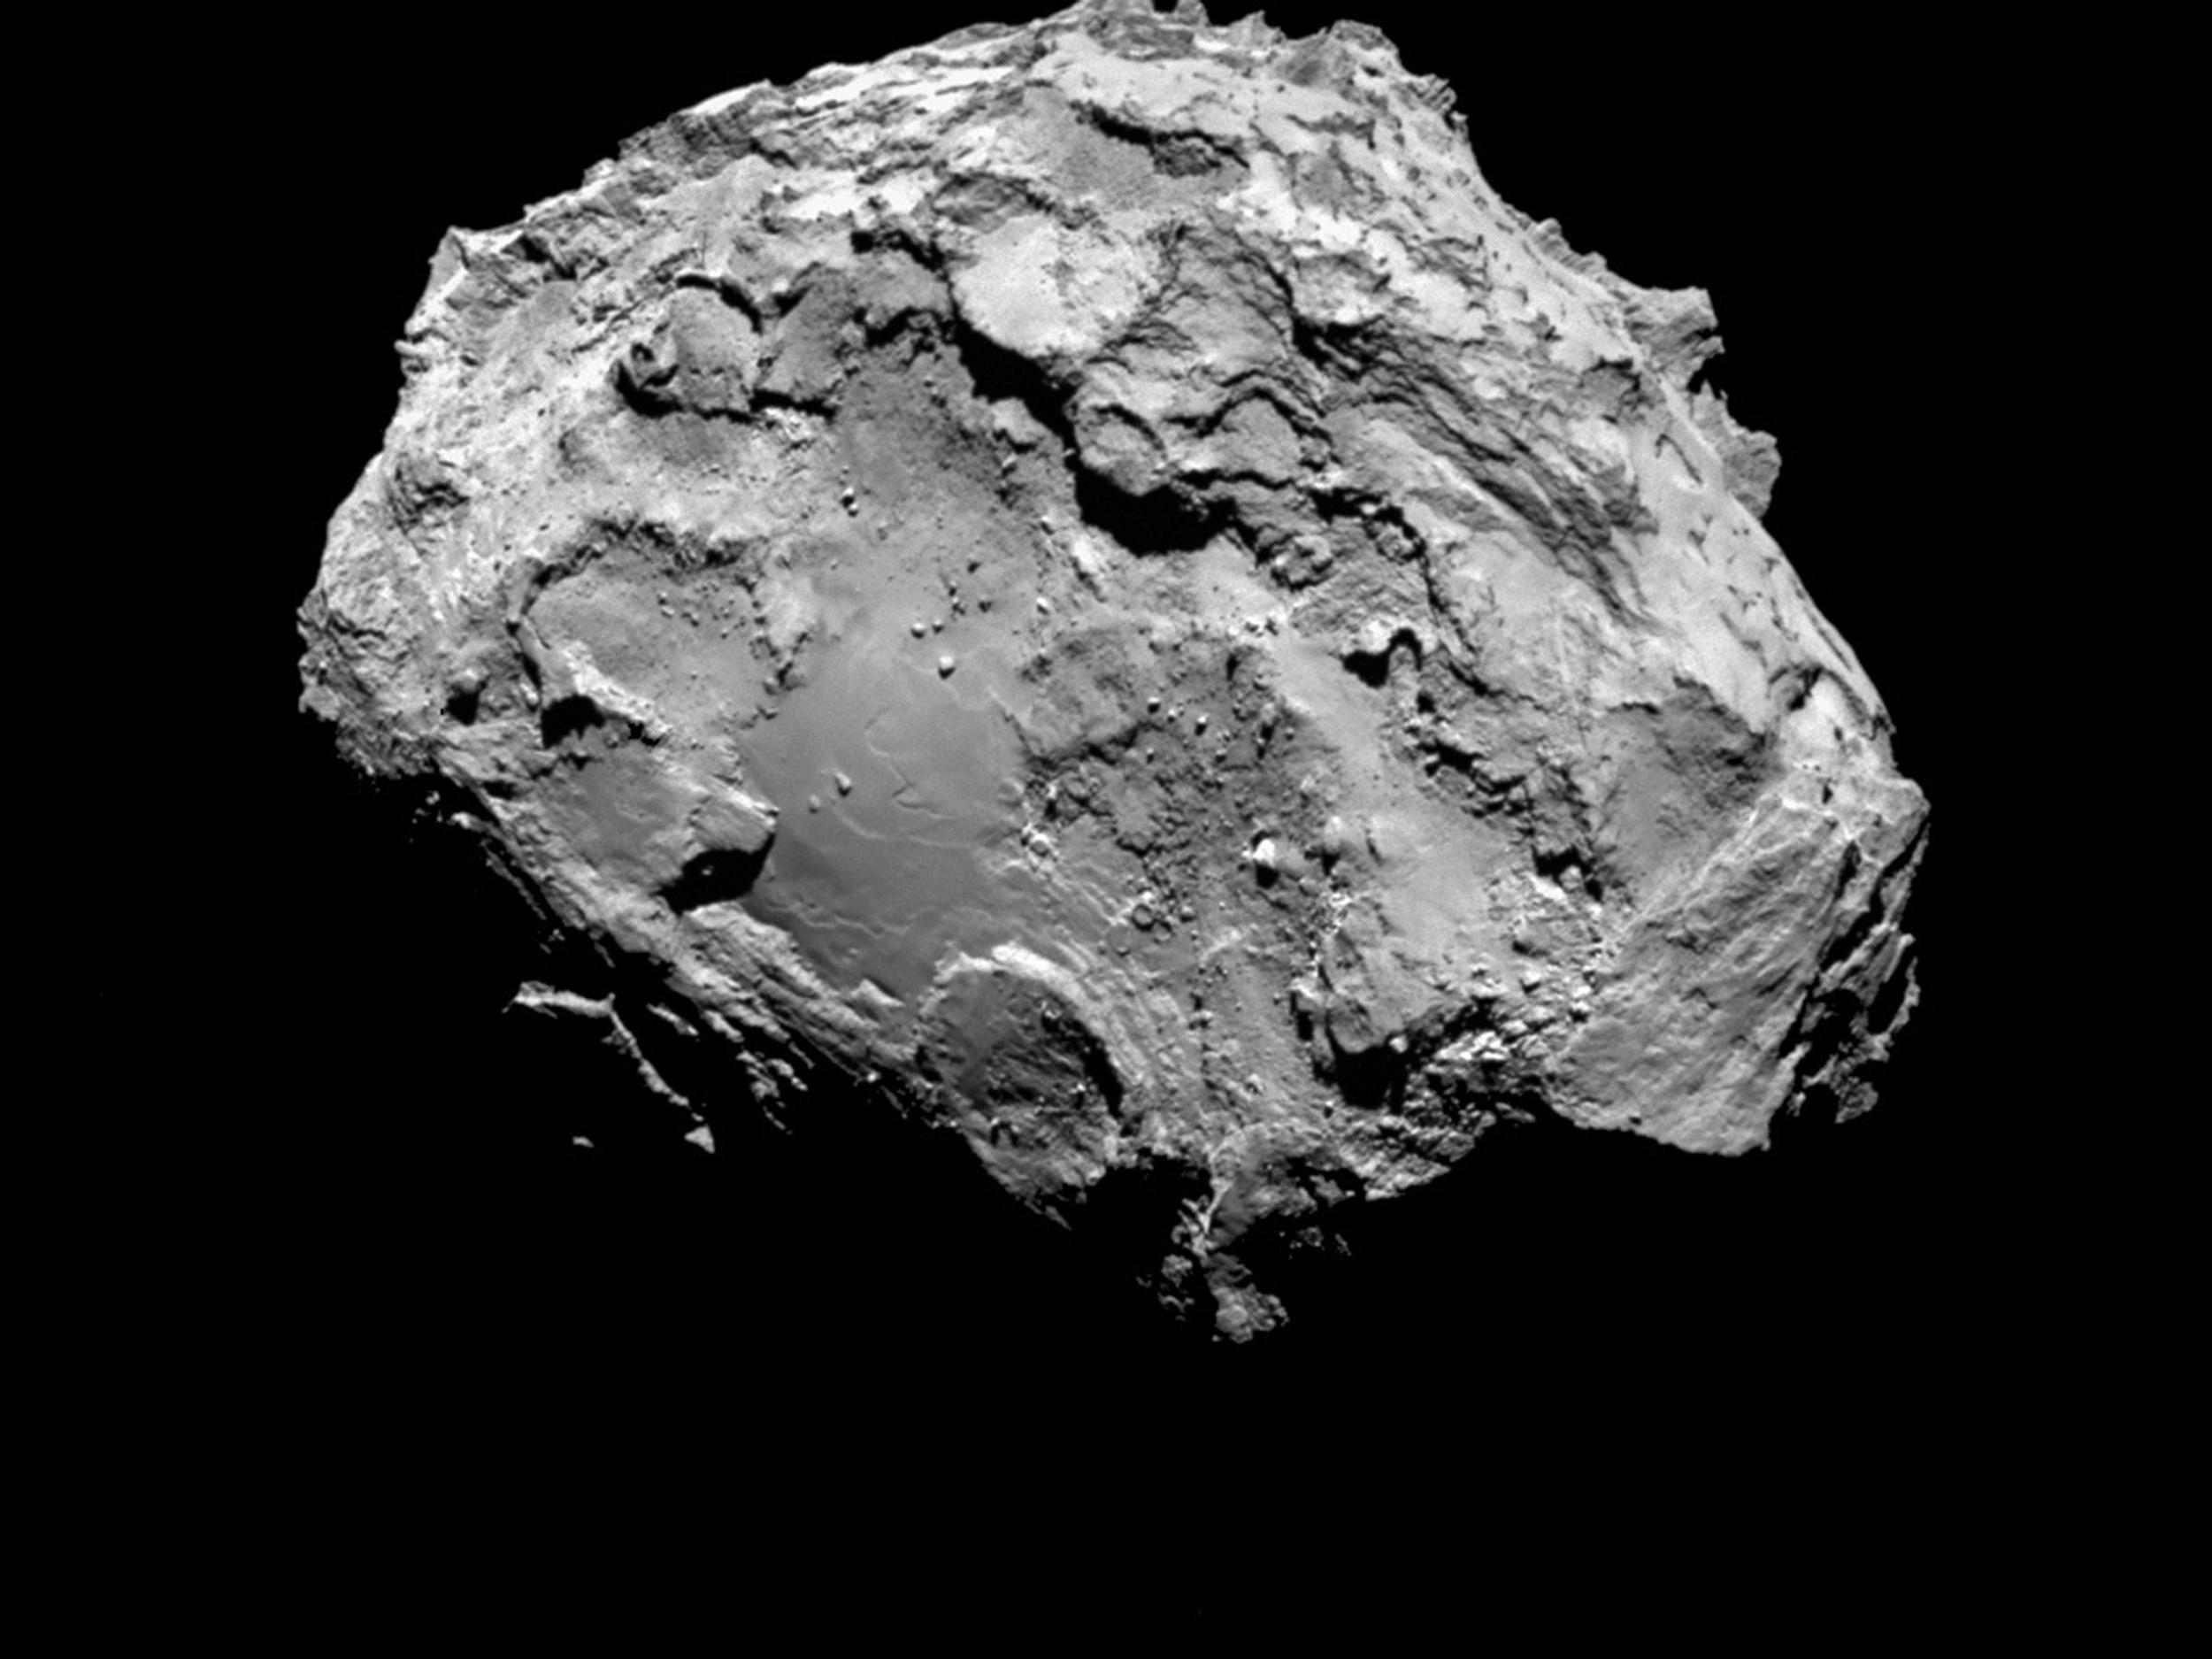 A Cosmic First! Rosetta Probe Goes Into Odd-Duck Orbit ... Rosetta